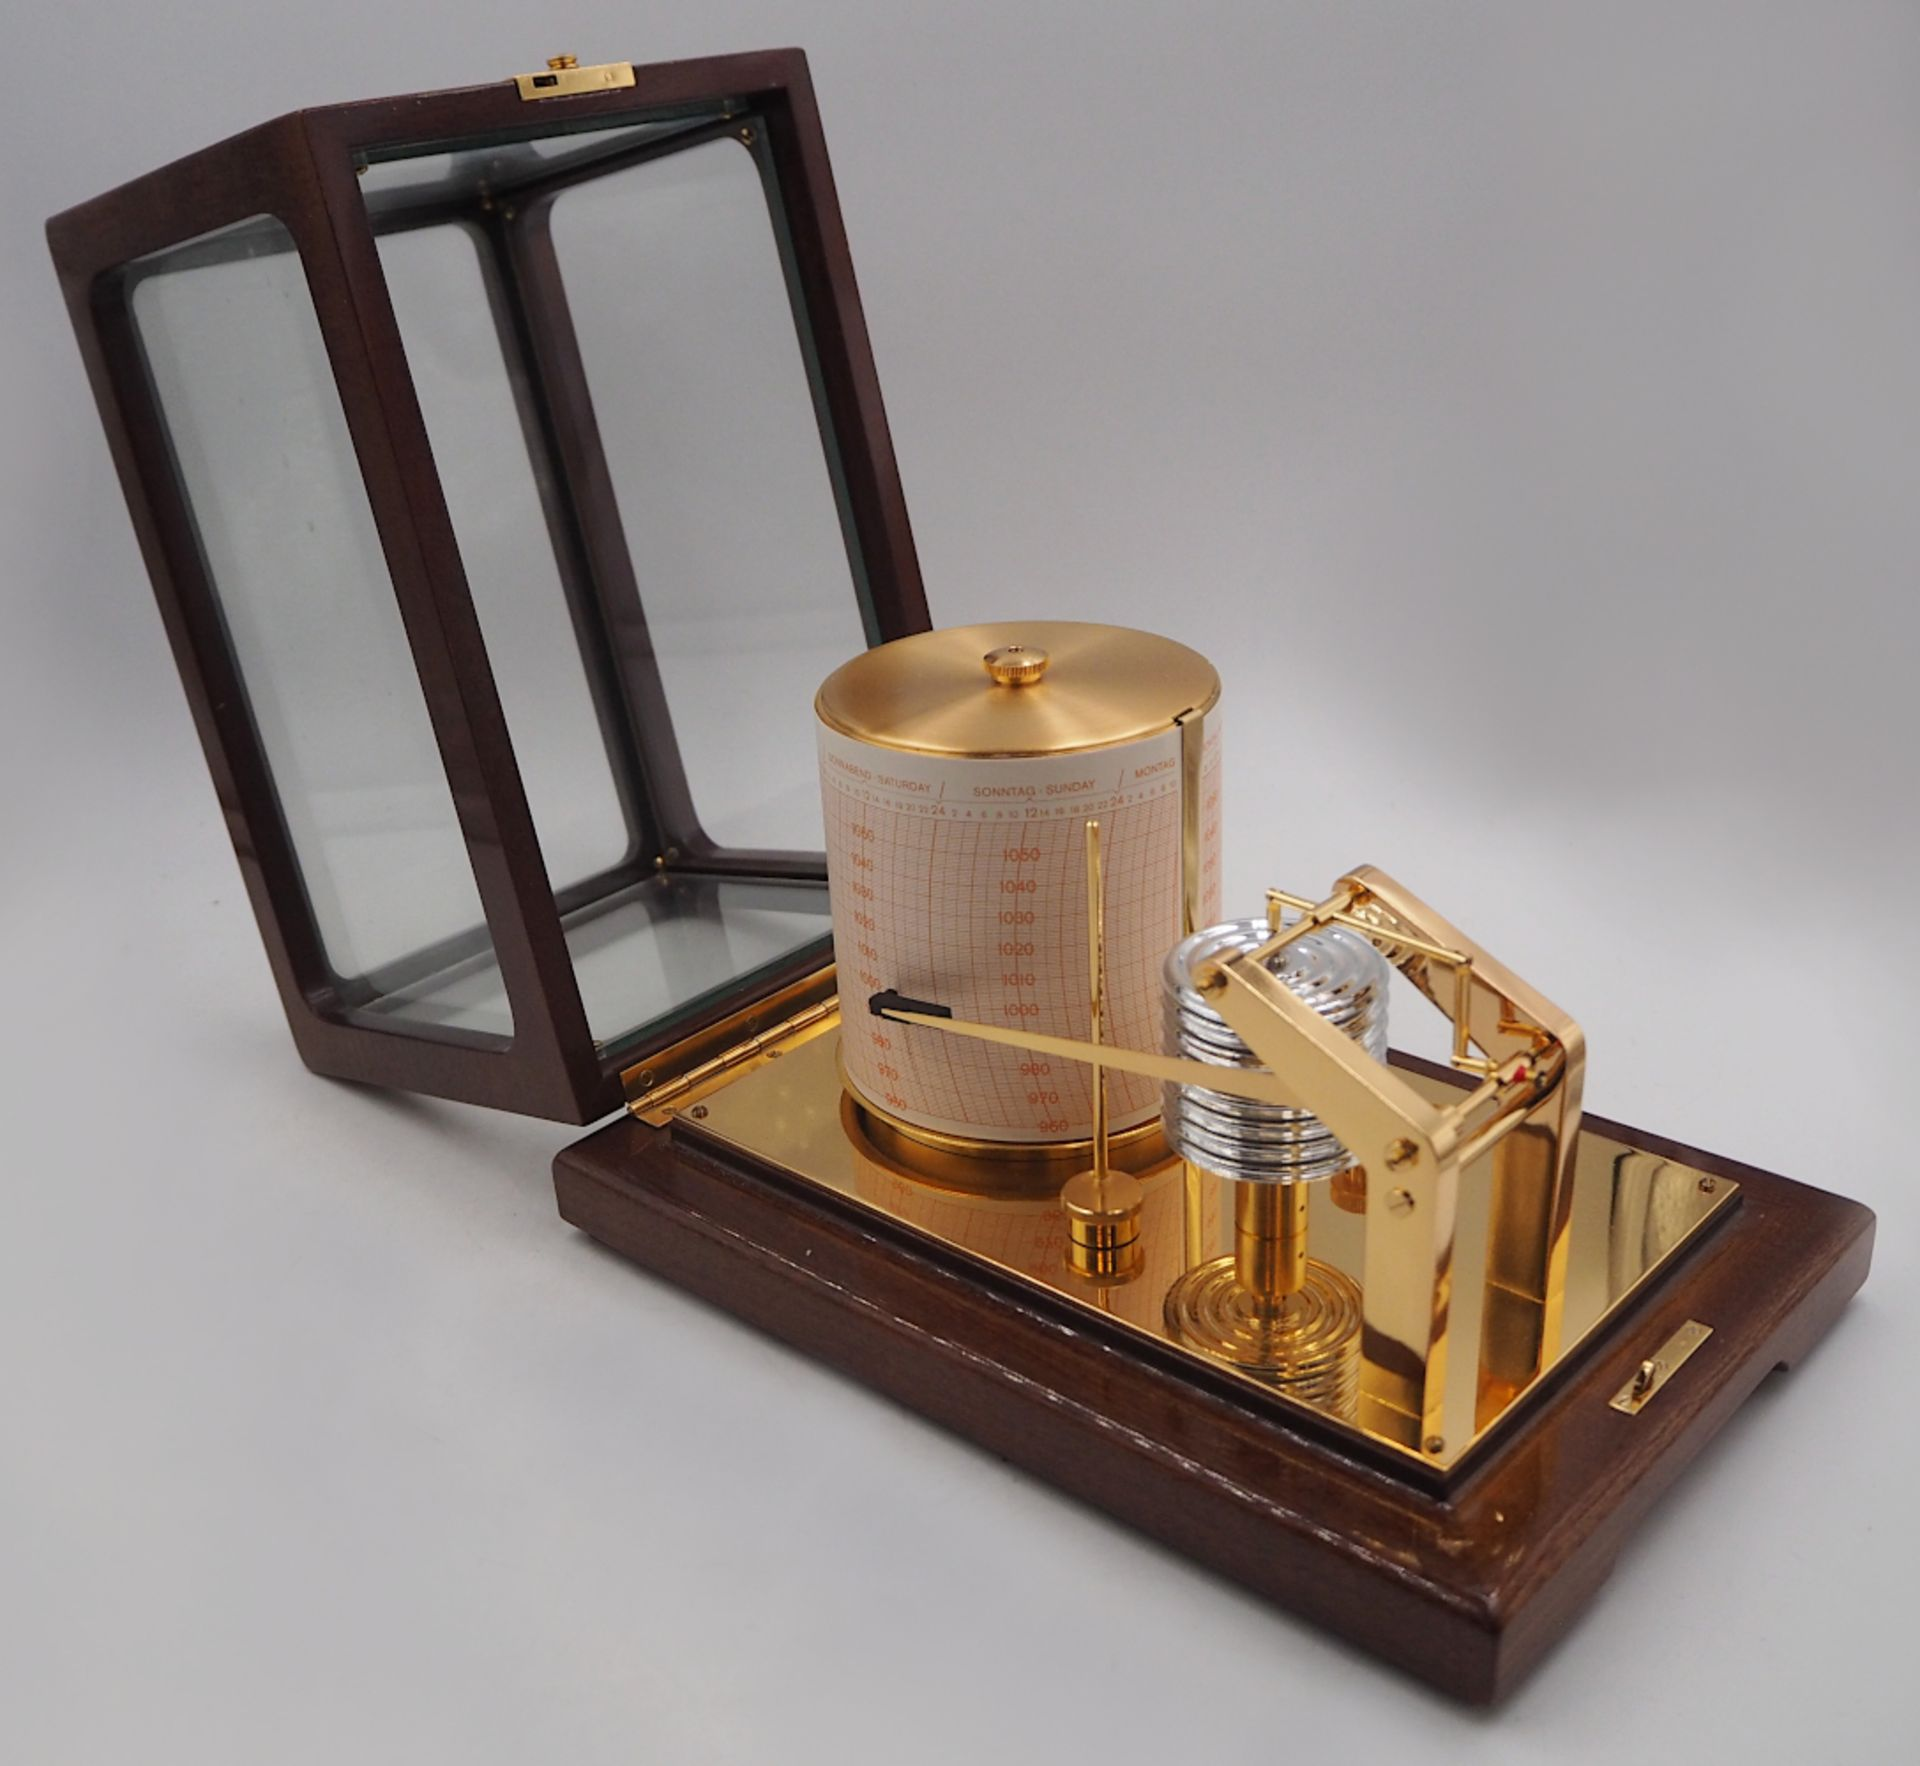 1 Trommelbarograph WEMPE CHRONOMETERWERKE GmbH, 20. Jh. wohl Mahagoni-Gehäuse allseit